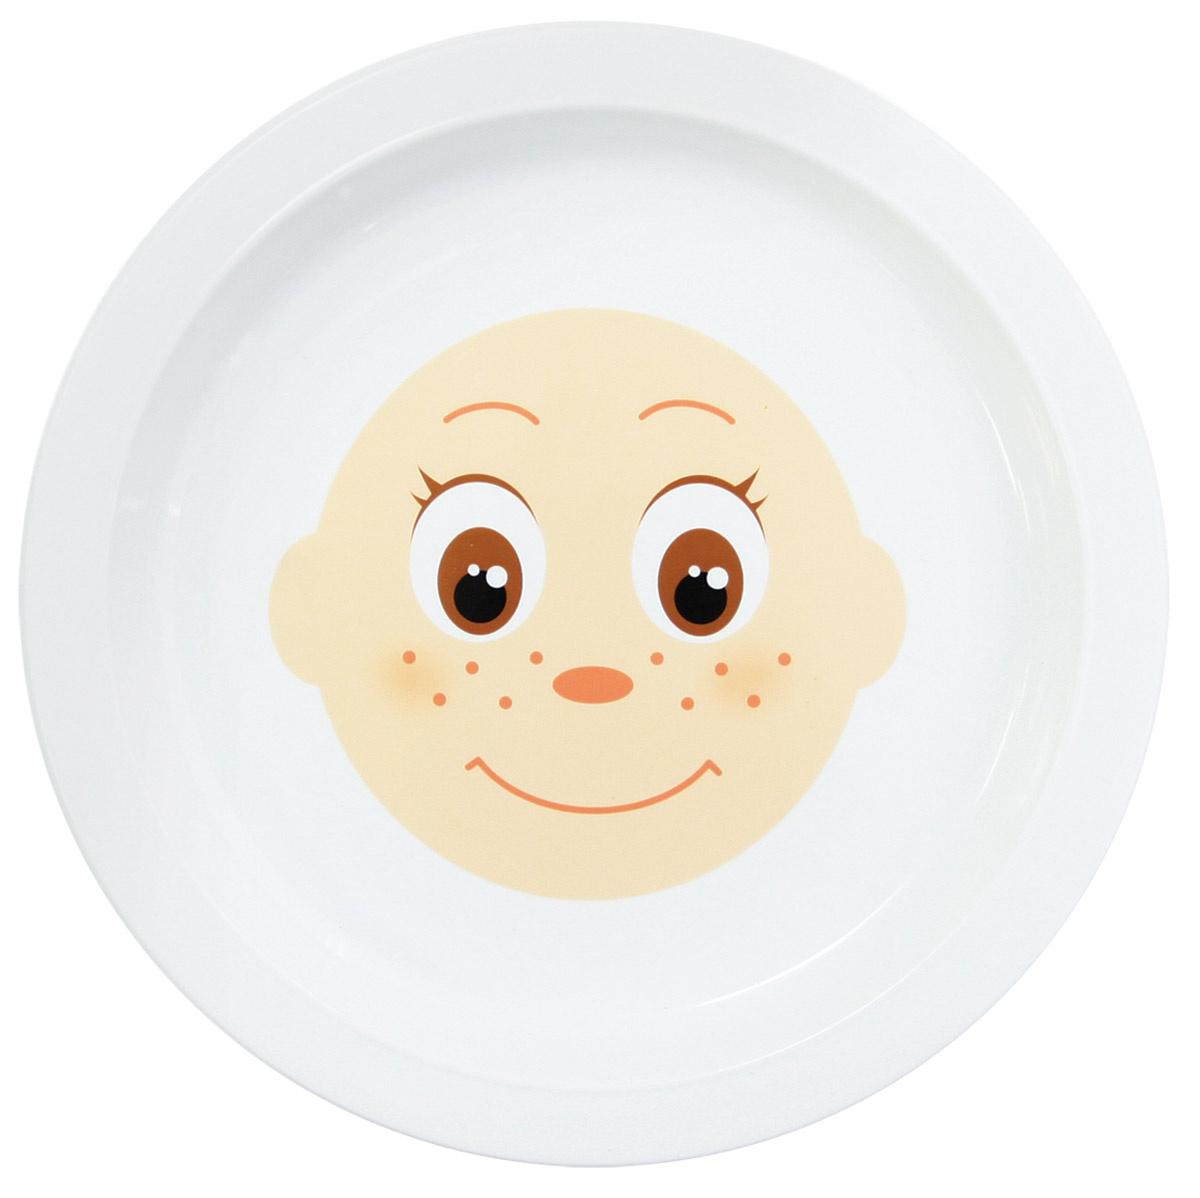 Тарелка Lubby, Полипропилен, диаметр 21 см #1